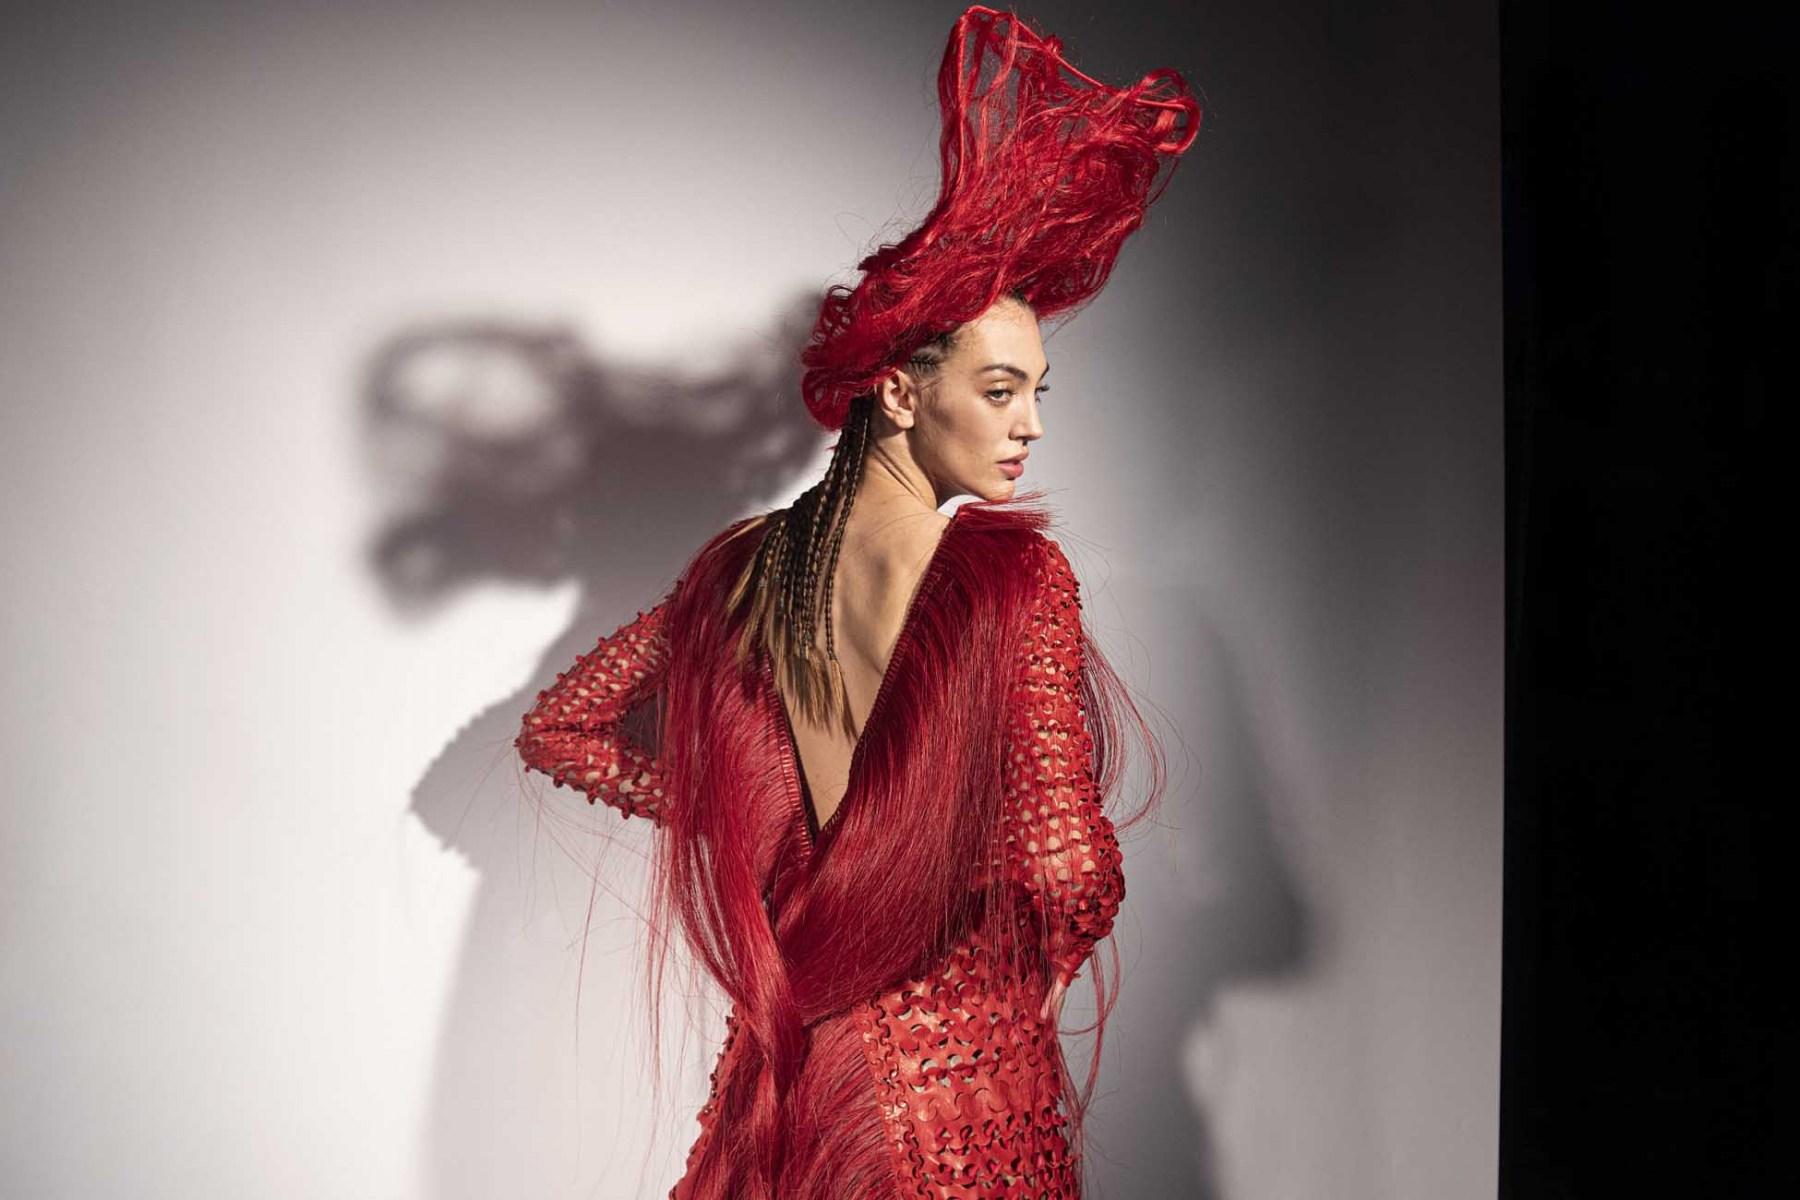 Jean-Paul-Gaultier-Haute-couture-Ete-2020-12